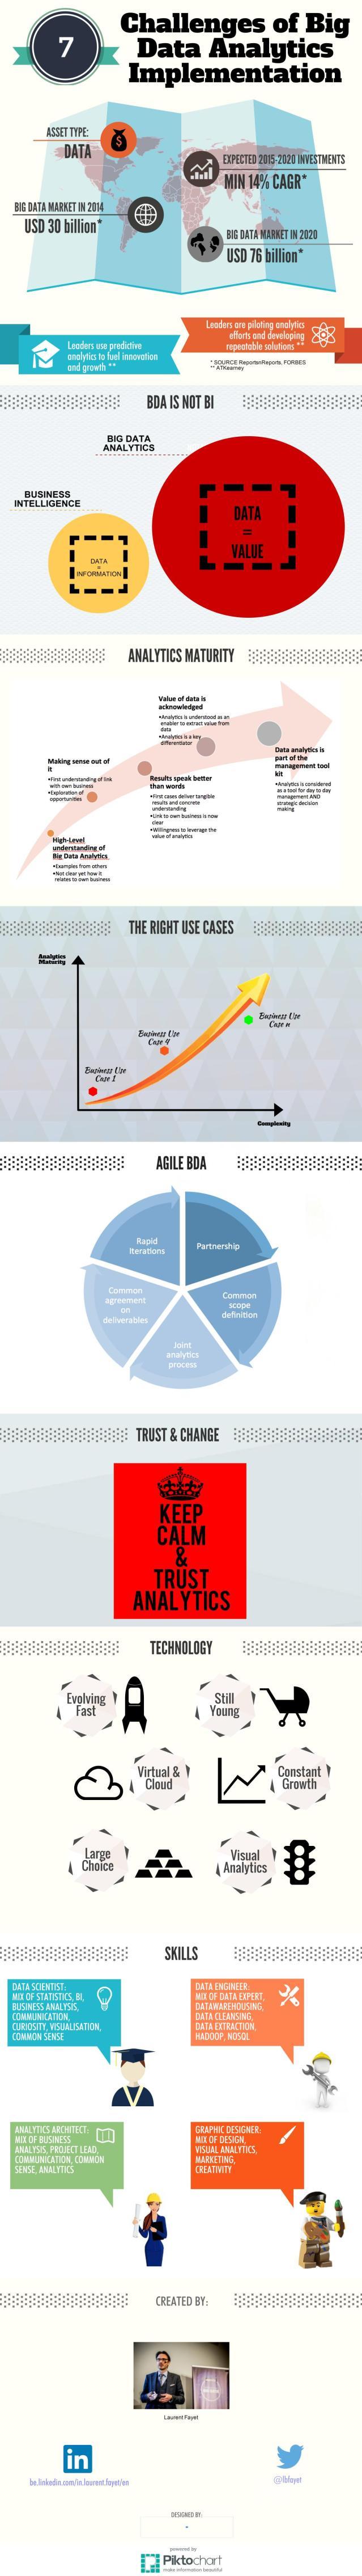 7 Challenges of Big Data Anlytics_bicorner